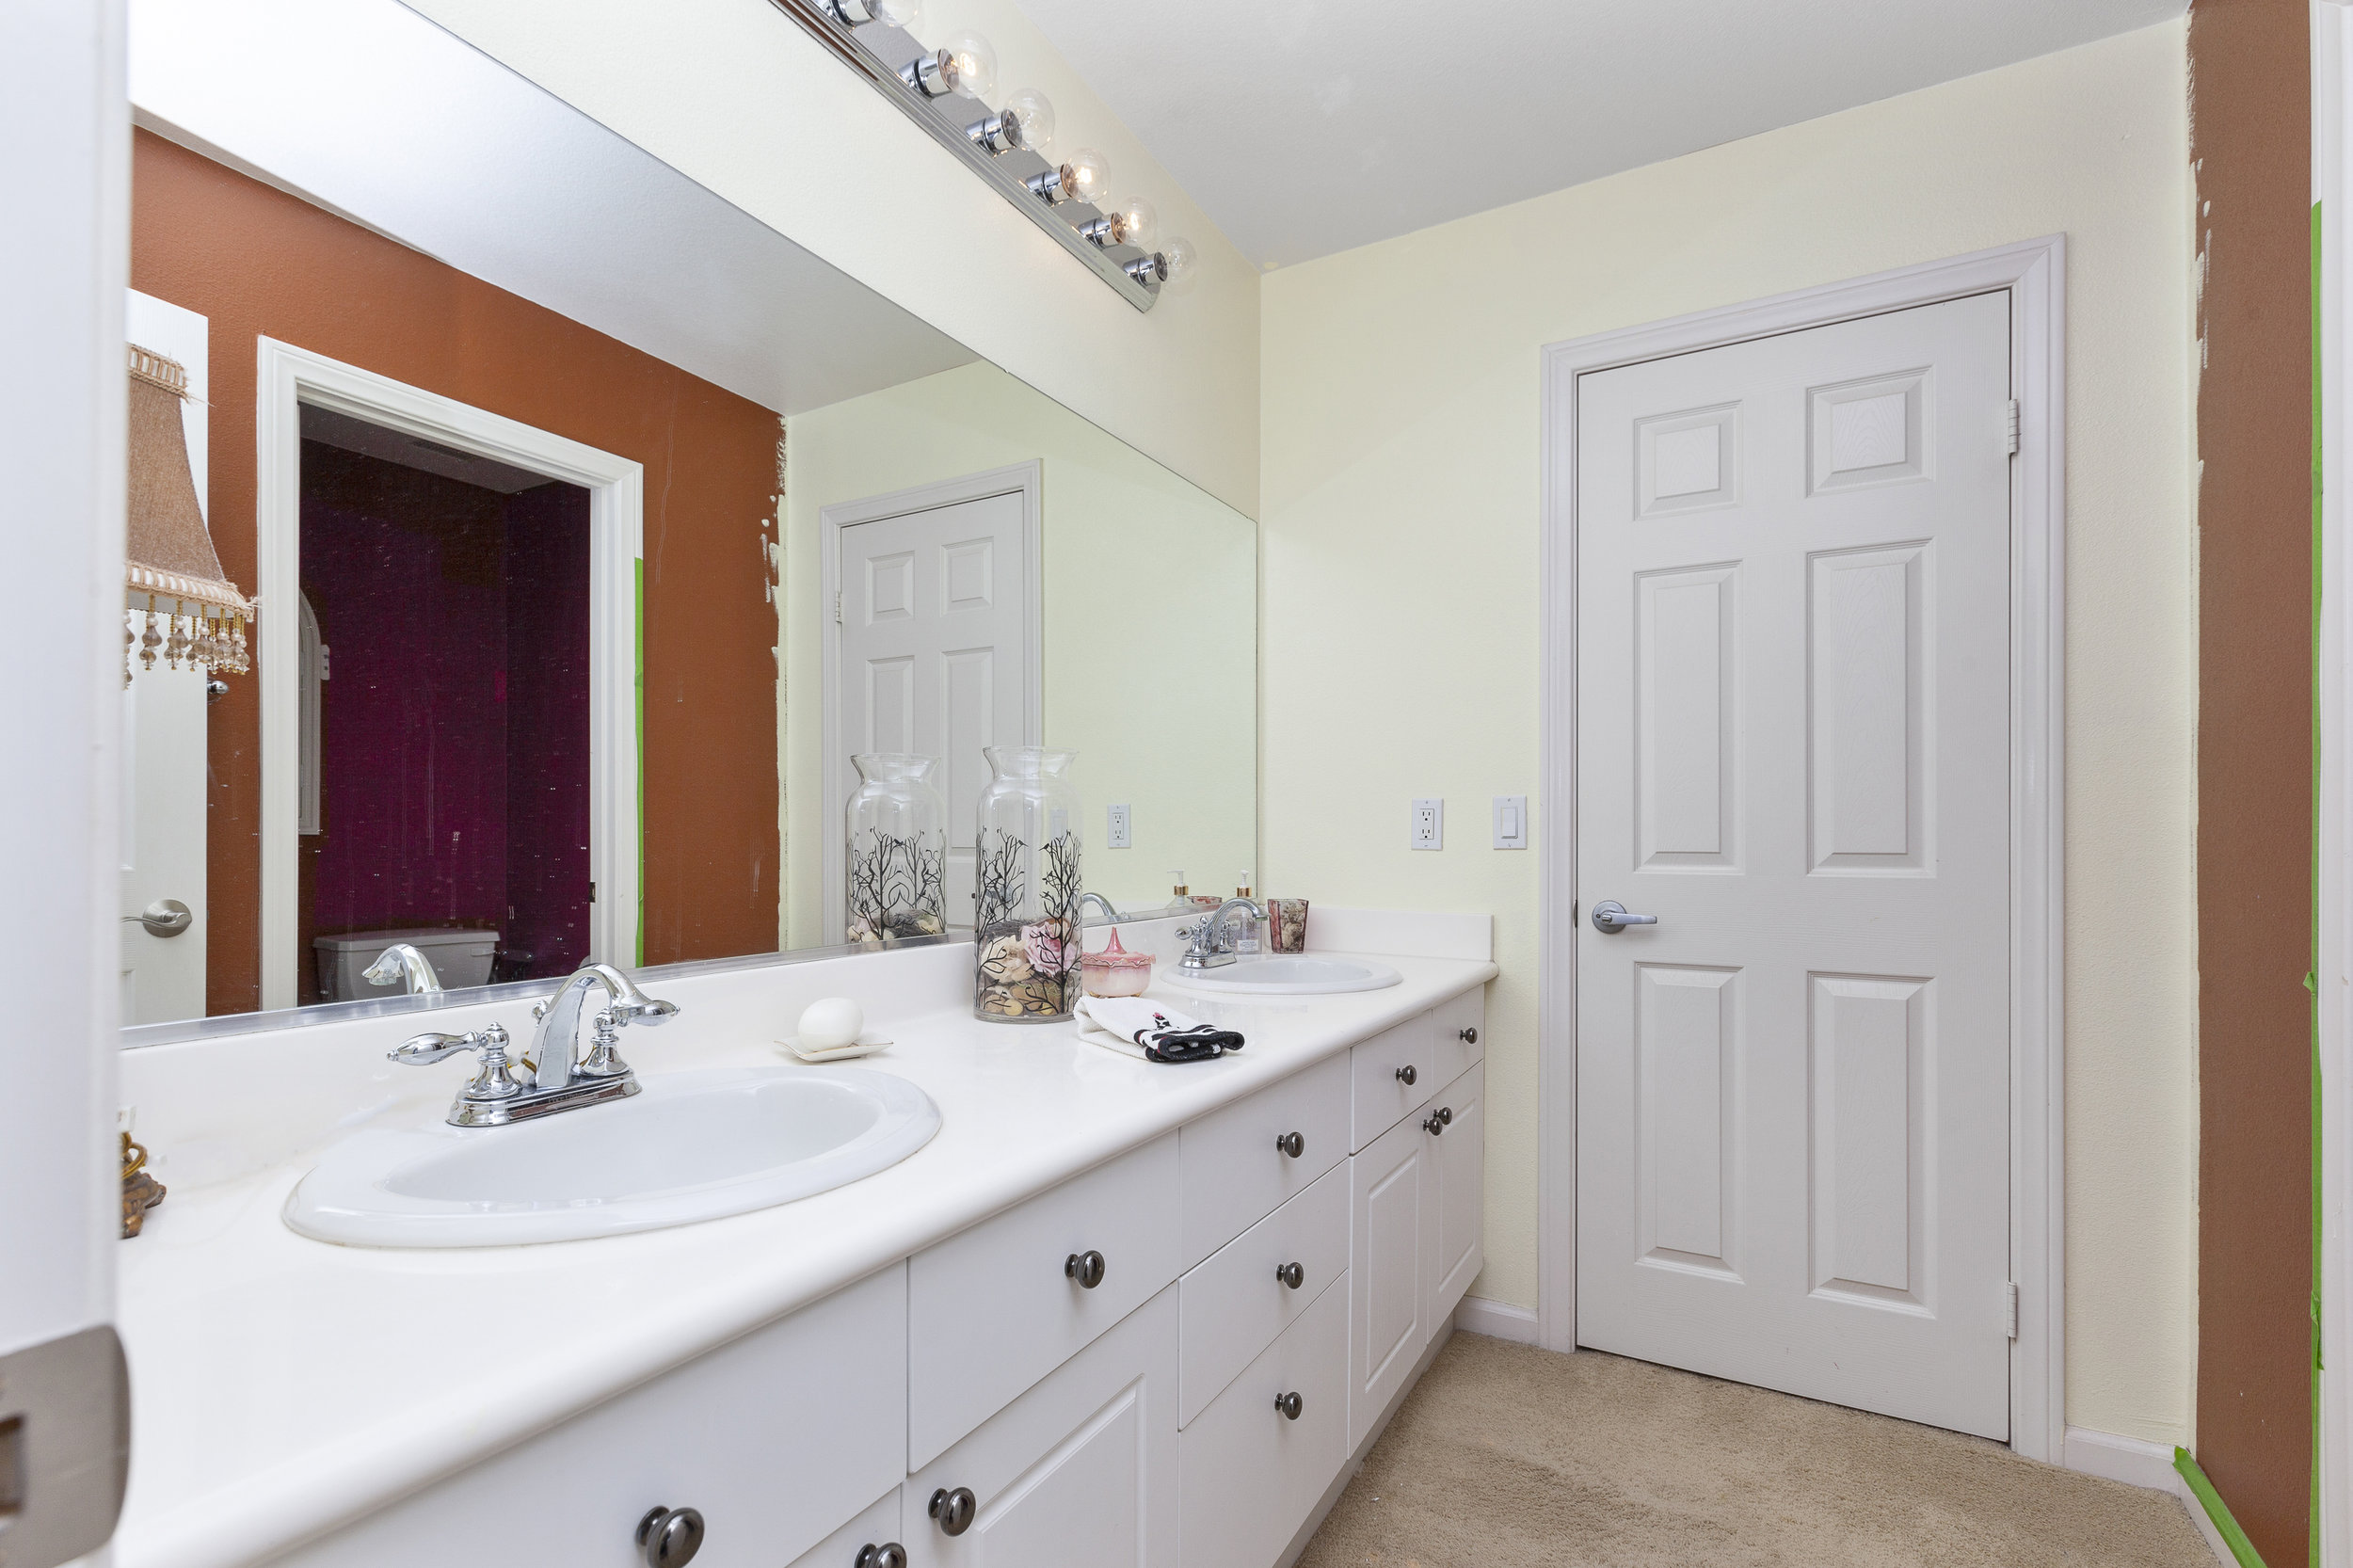 024_Bathroom .jpg